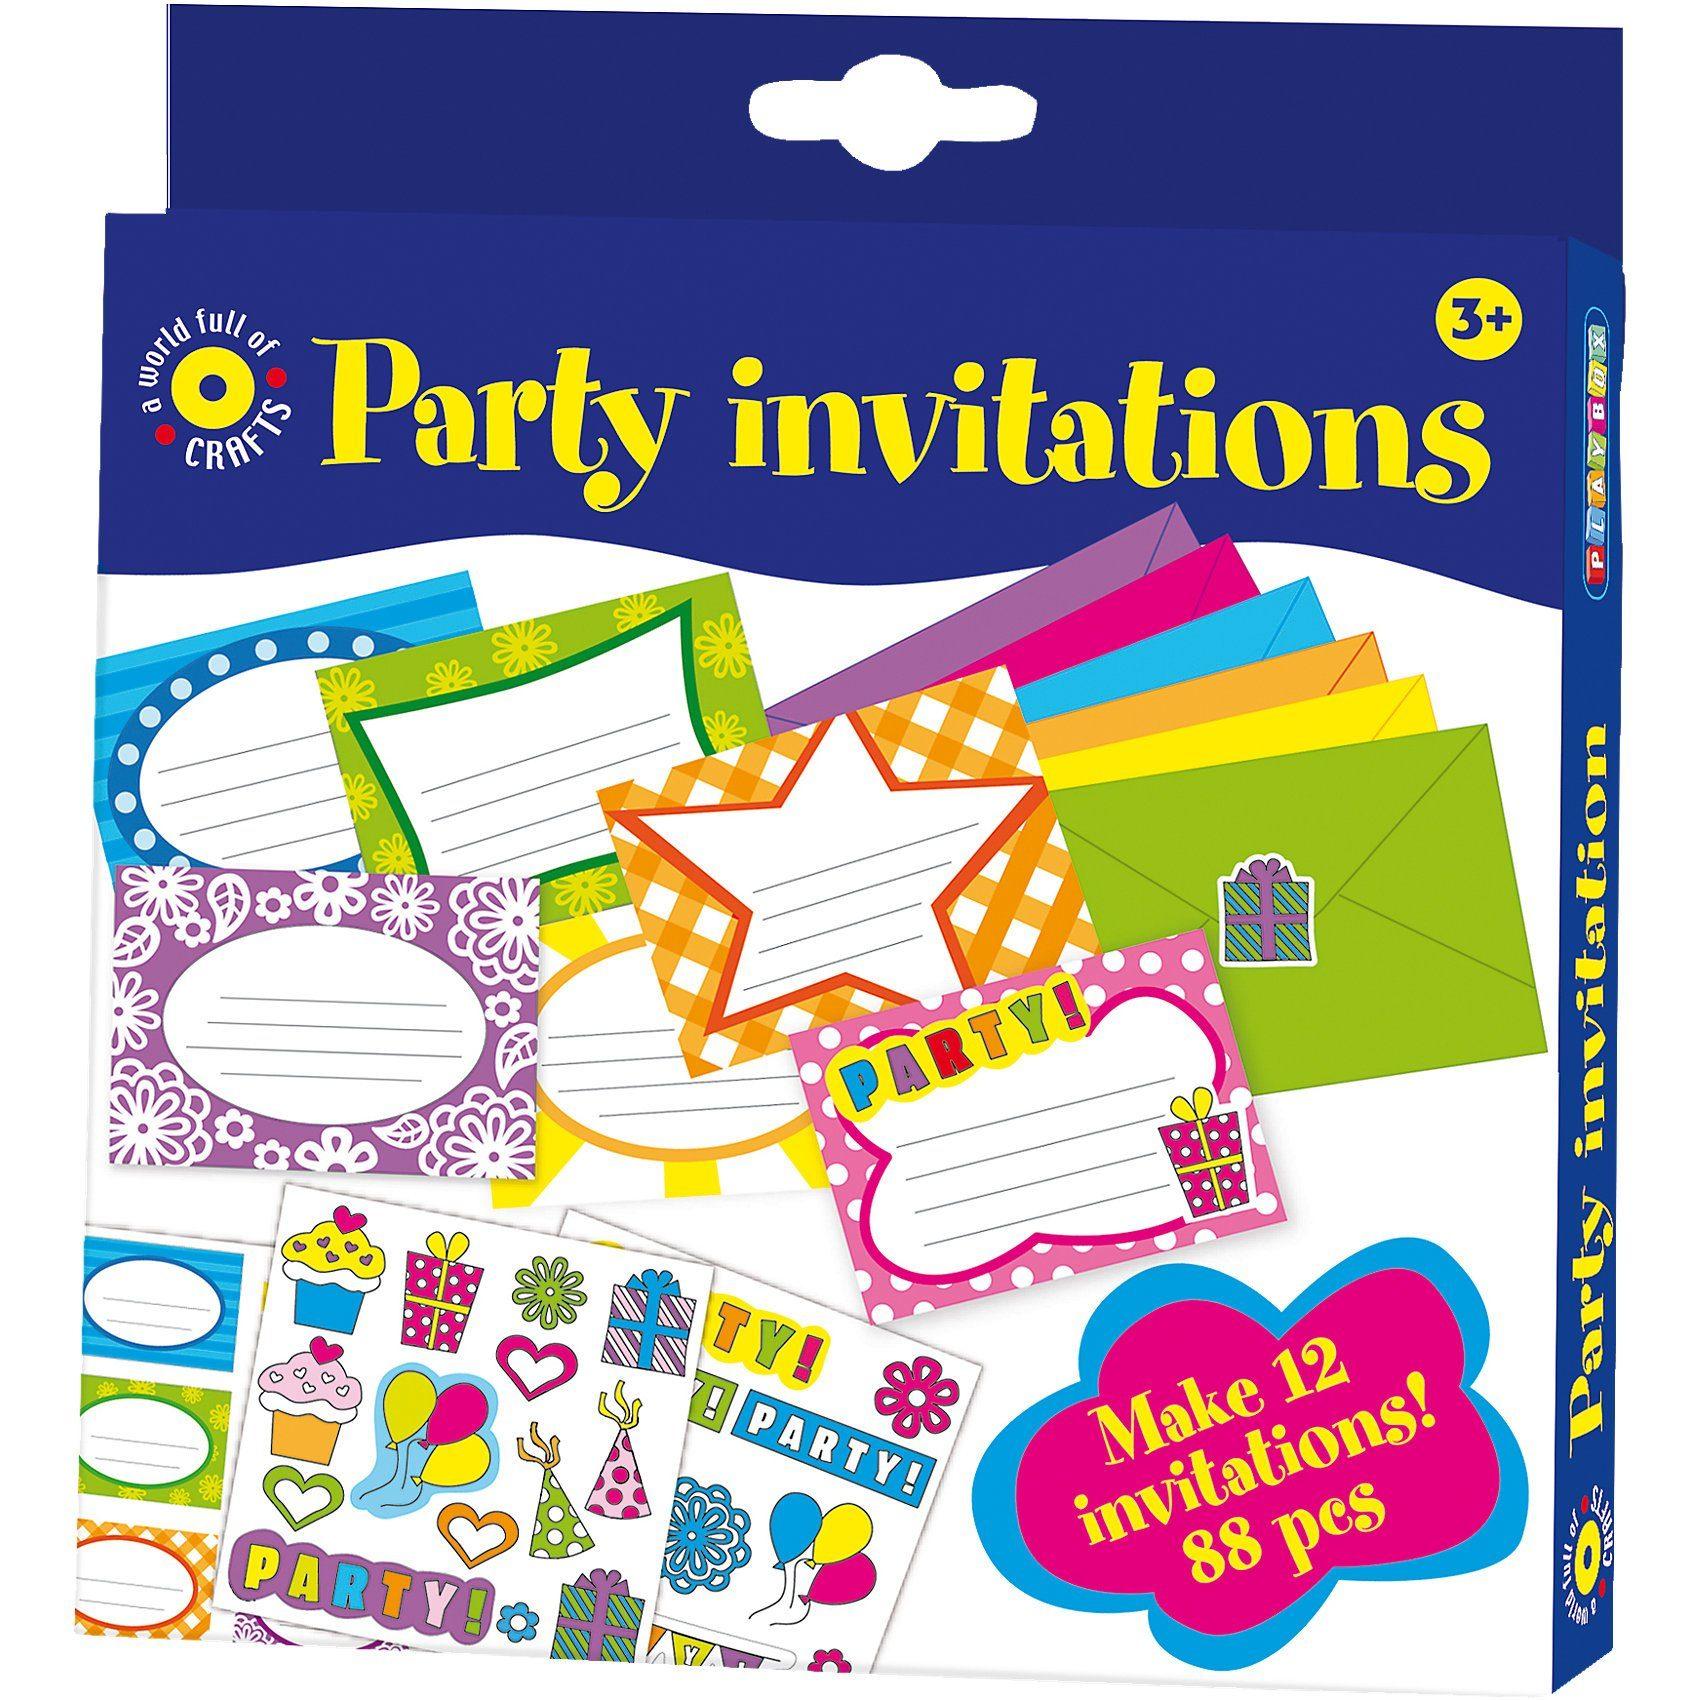 Playbox Bastelset Einladungskarten, 88 Teile